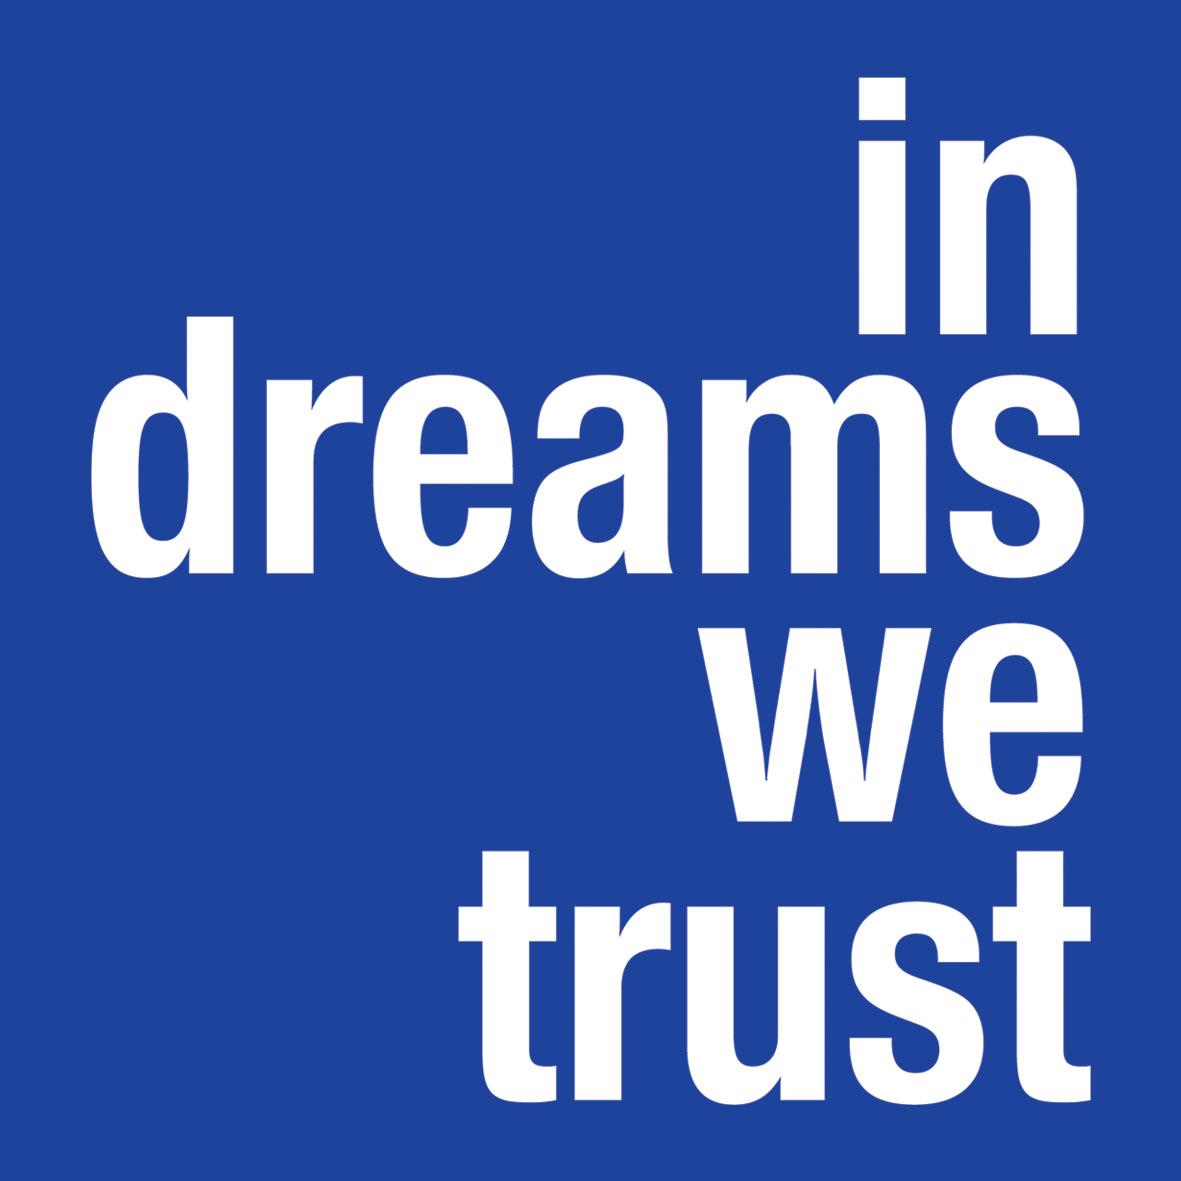 In dreams we trust